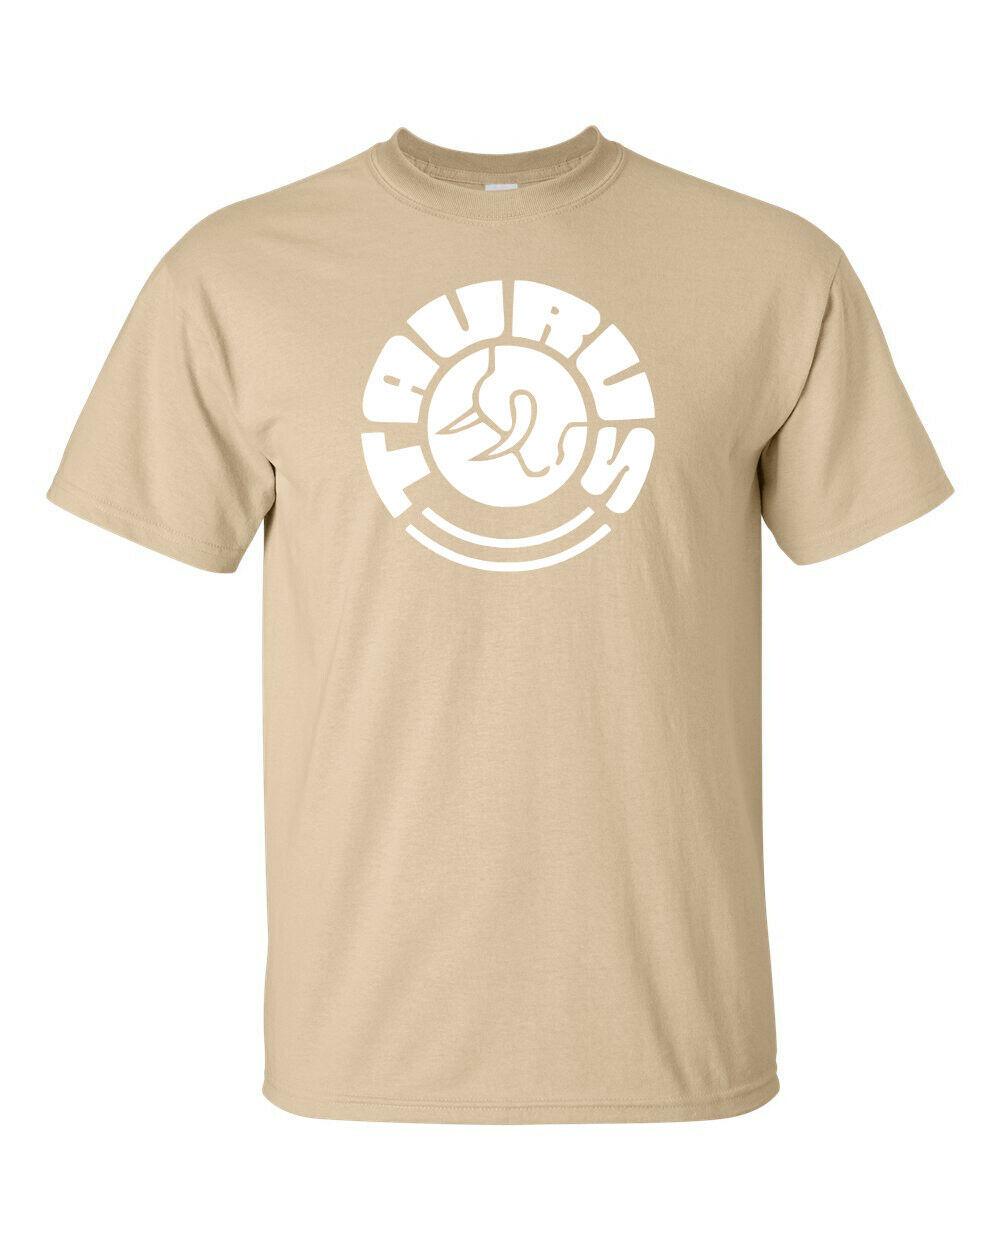 Taurus Firearms White Logo T Shirt 2nd Amendment Pro Gun Rights Rifle Pistol Tee image 10